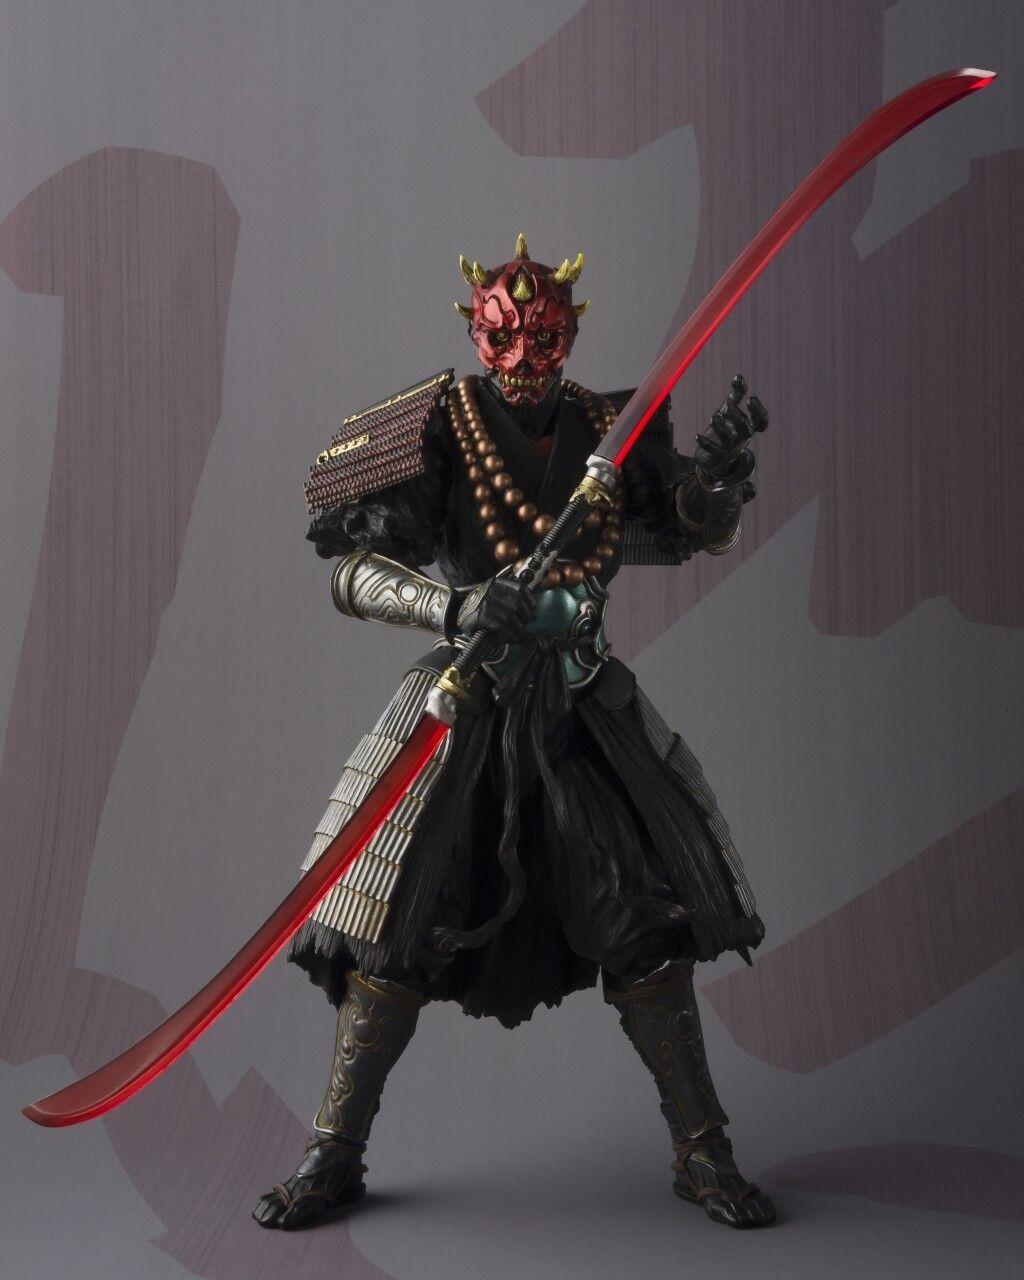 Star Wars Movie Realization - Sohei Darth Maul Action Figure (Bandai)